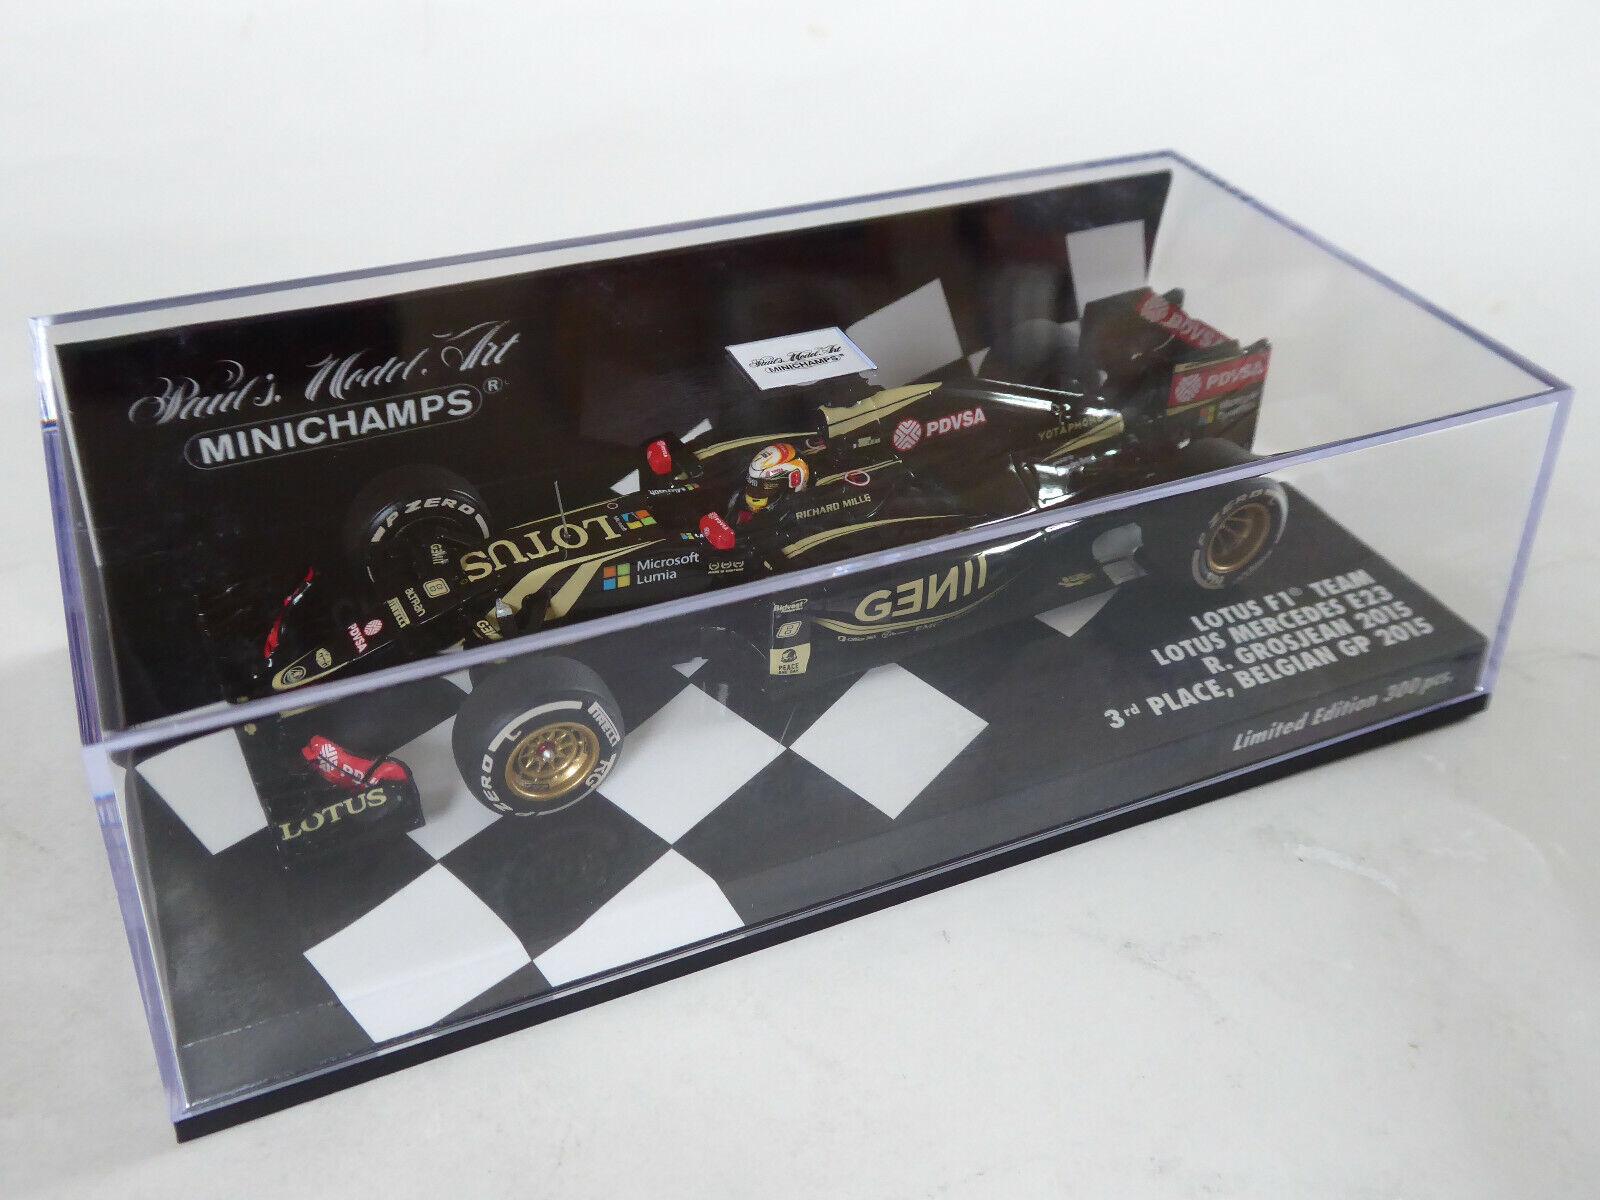 MINICHAMPS 1 43 LOTUS  e23 Mercedes Hybride f1 team 2015 Kristensen 3rd Belgique neuf dans sa boîte  vente en ligne